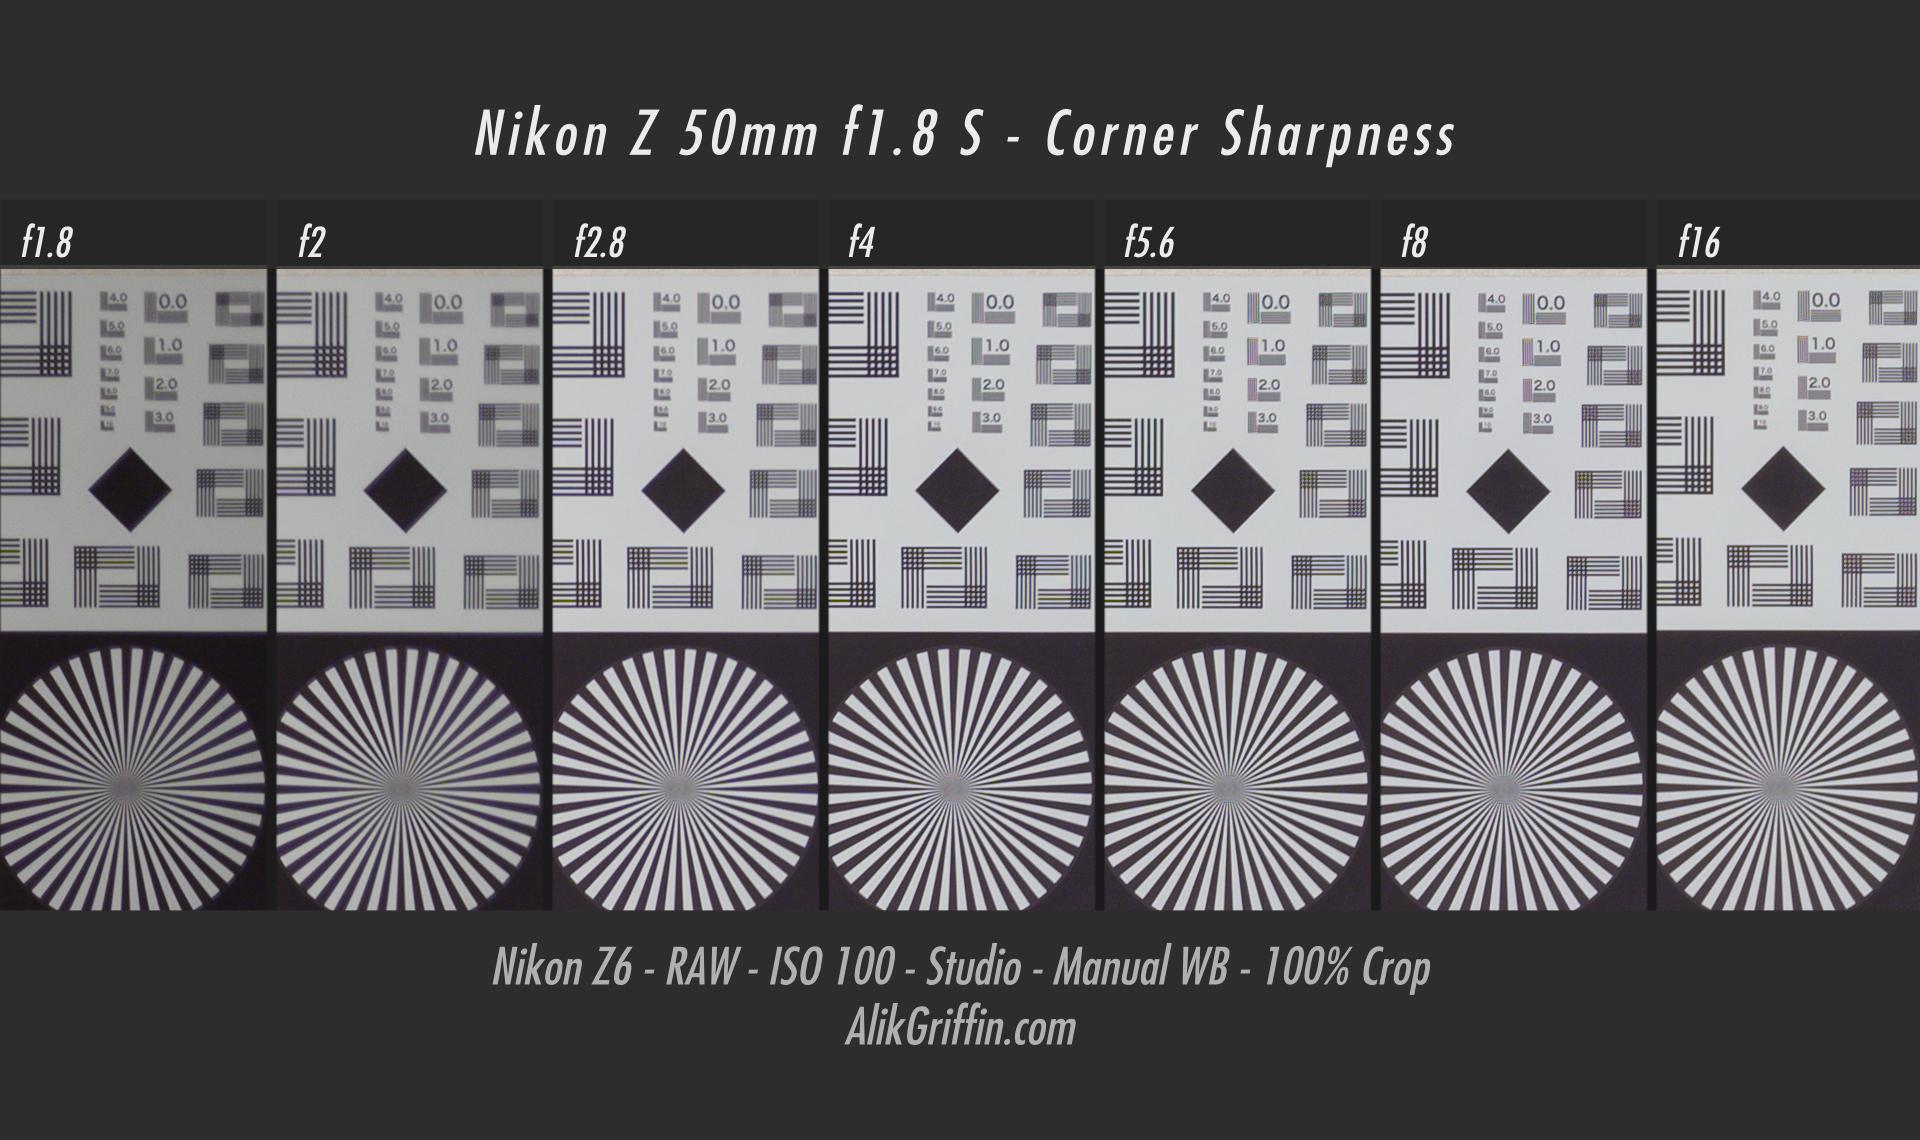 Nikon 50mm f1.8 S Corner Sharpness